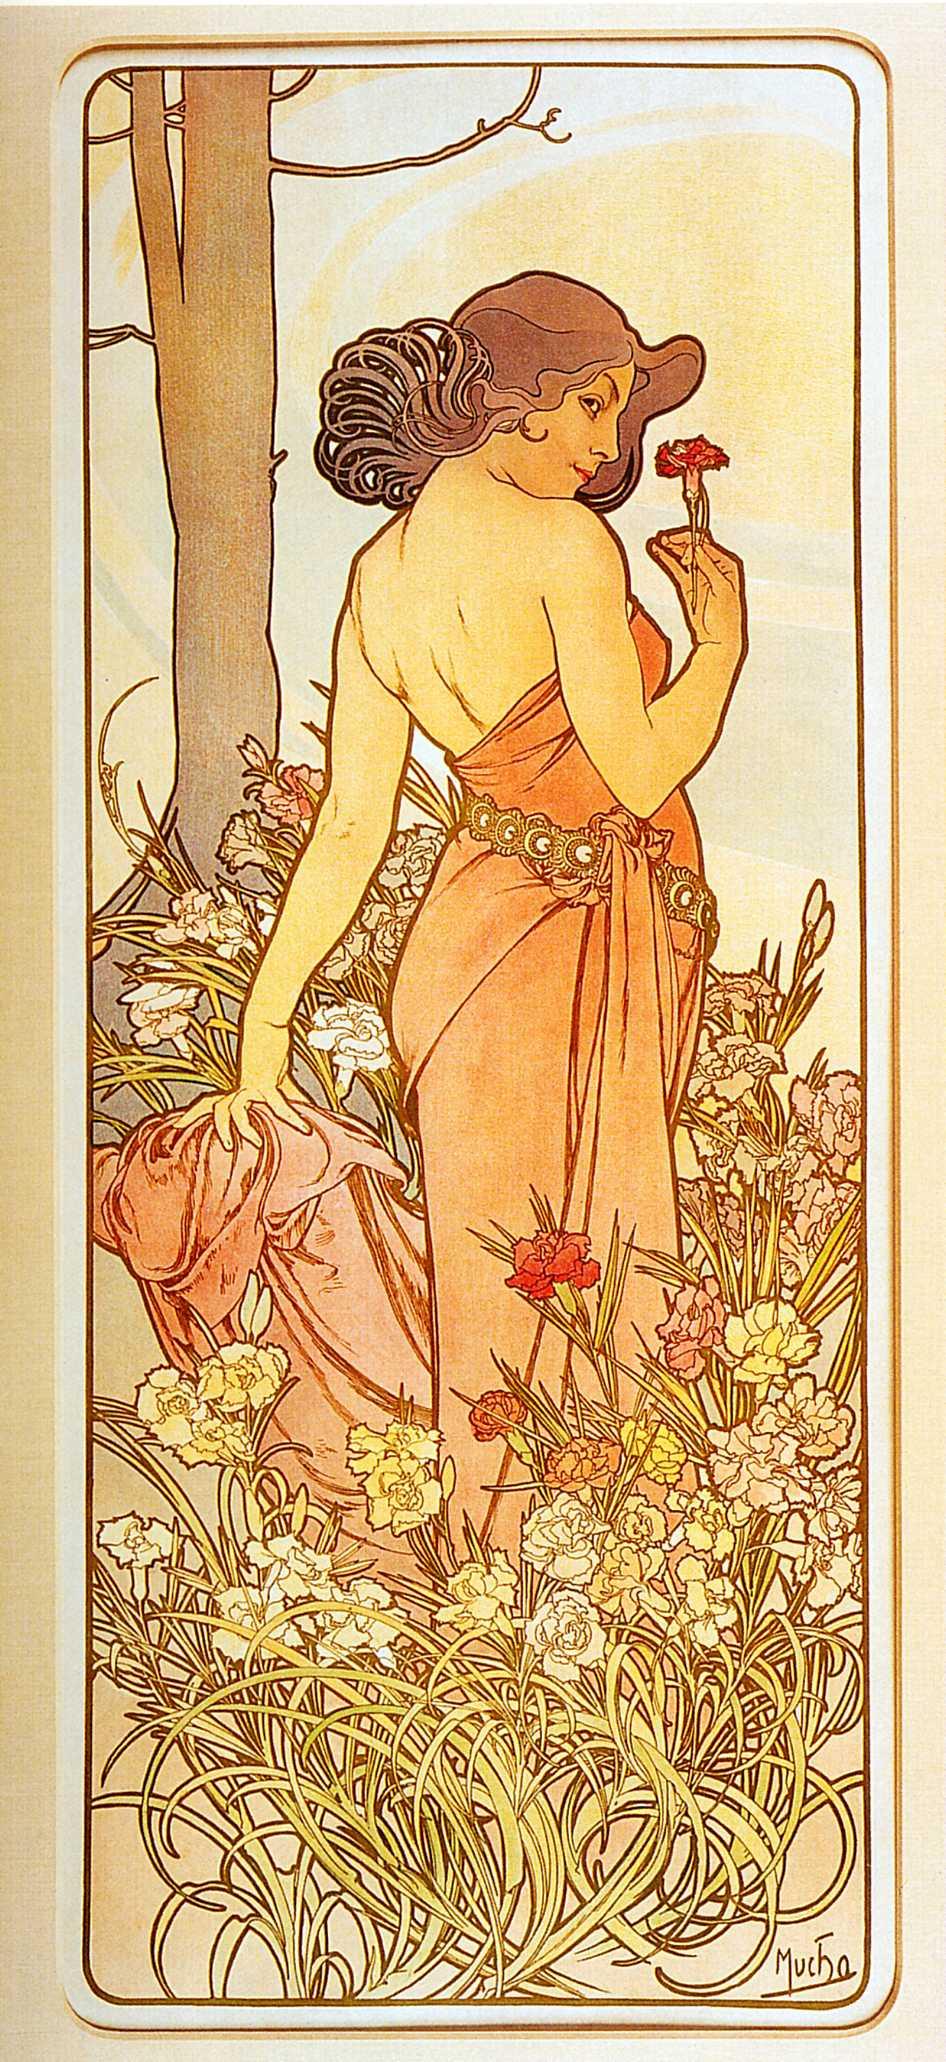 Alfons Mucha. Flowers: Carnation